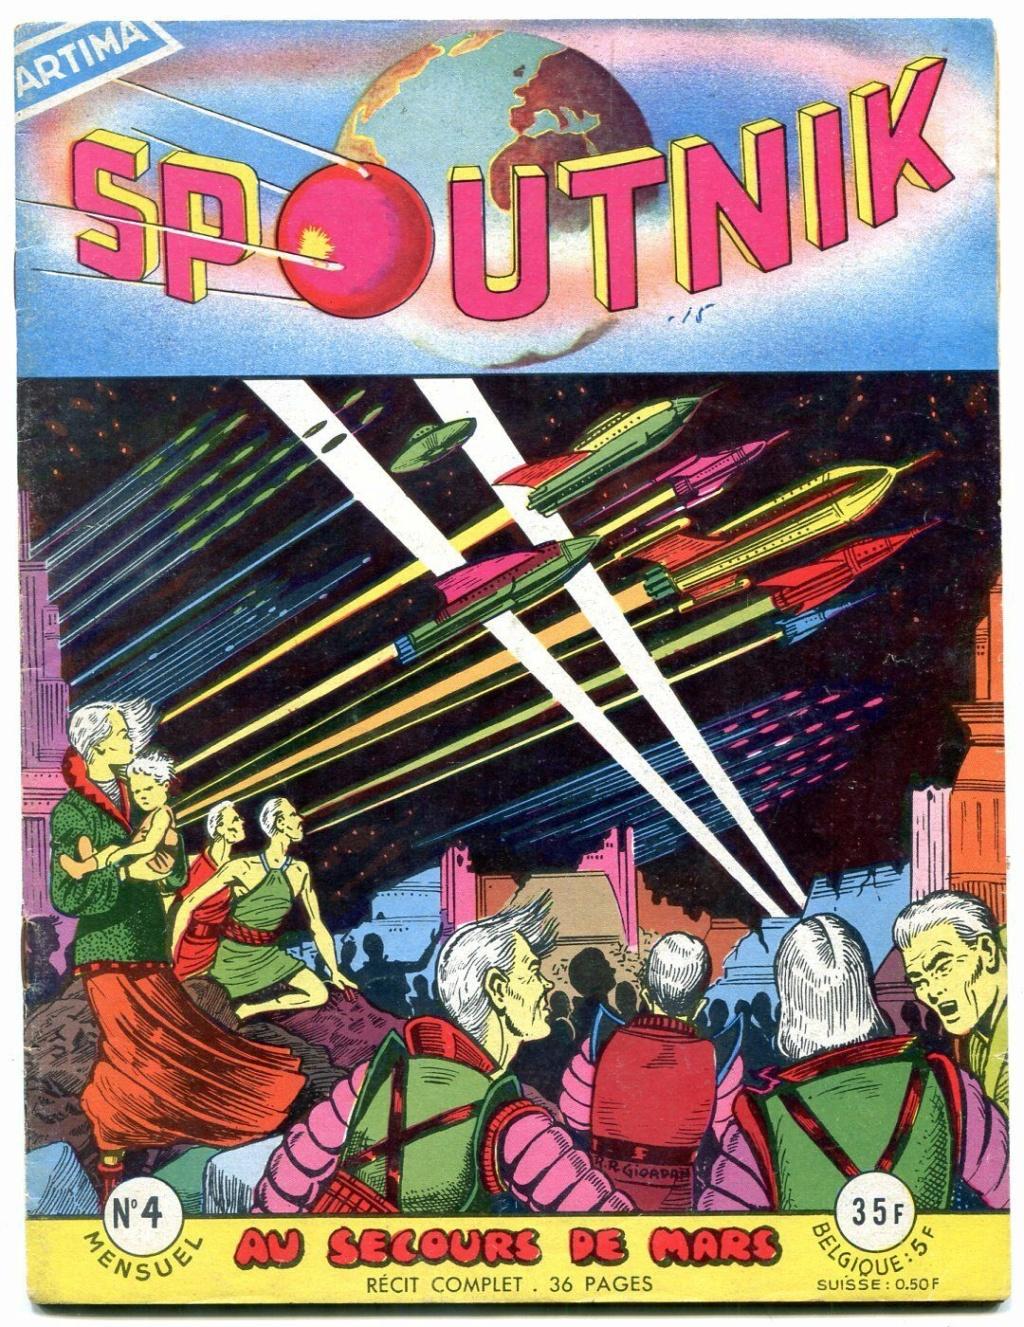 Spunik - Spoutnik - satellite, space age, design & style S-l16062